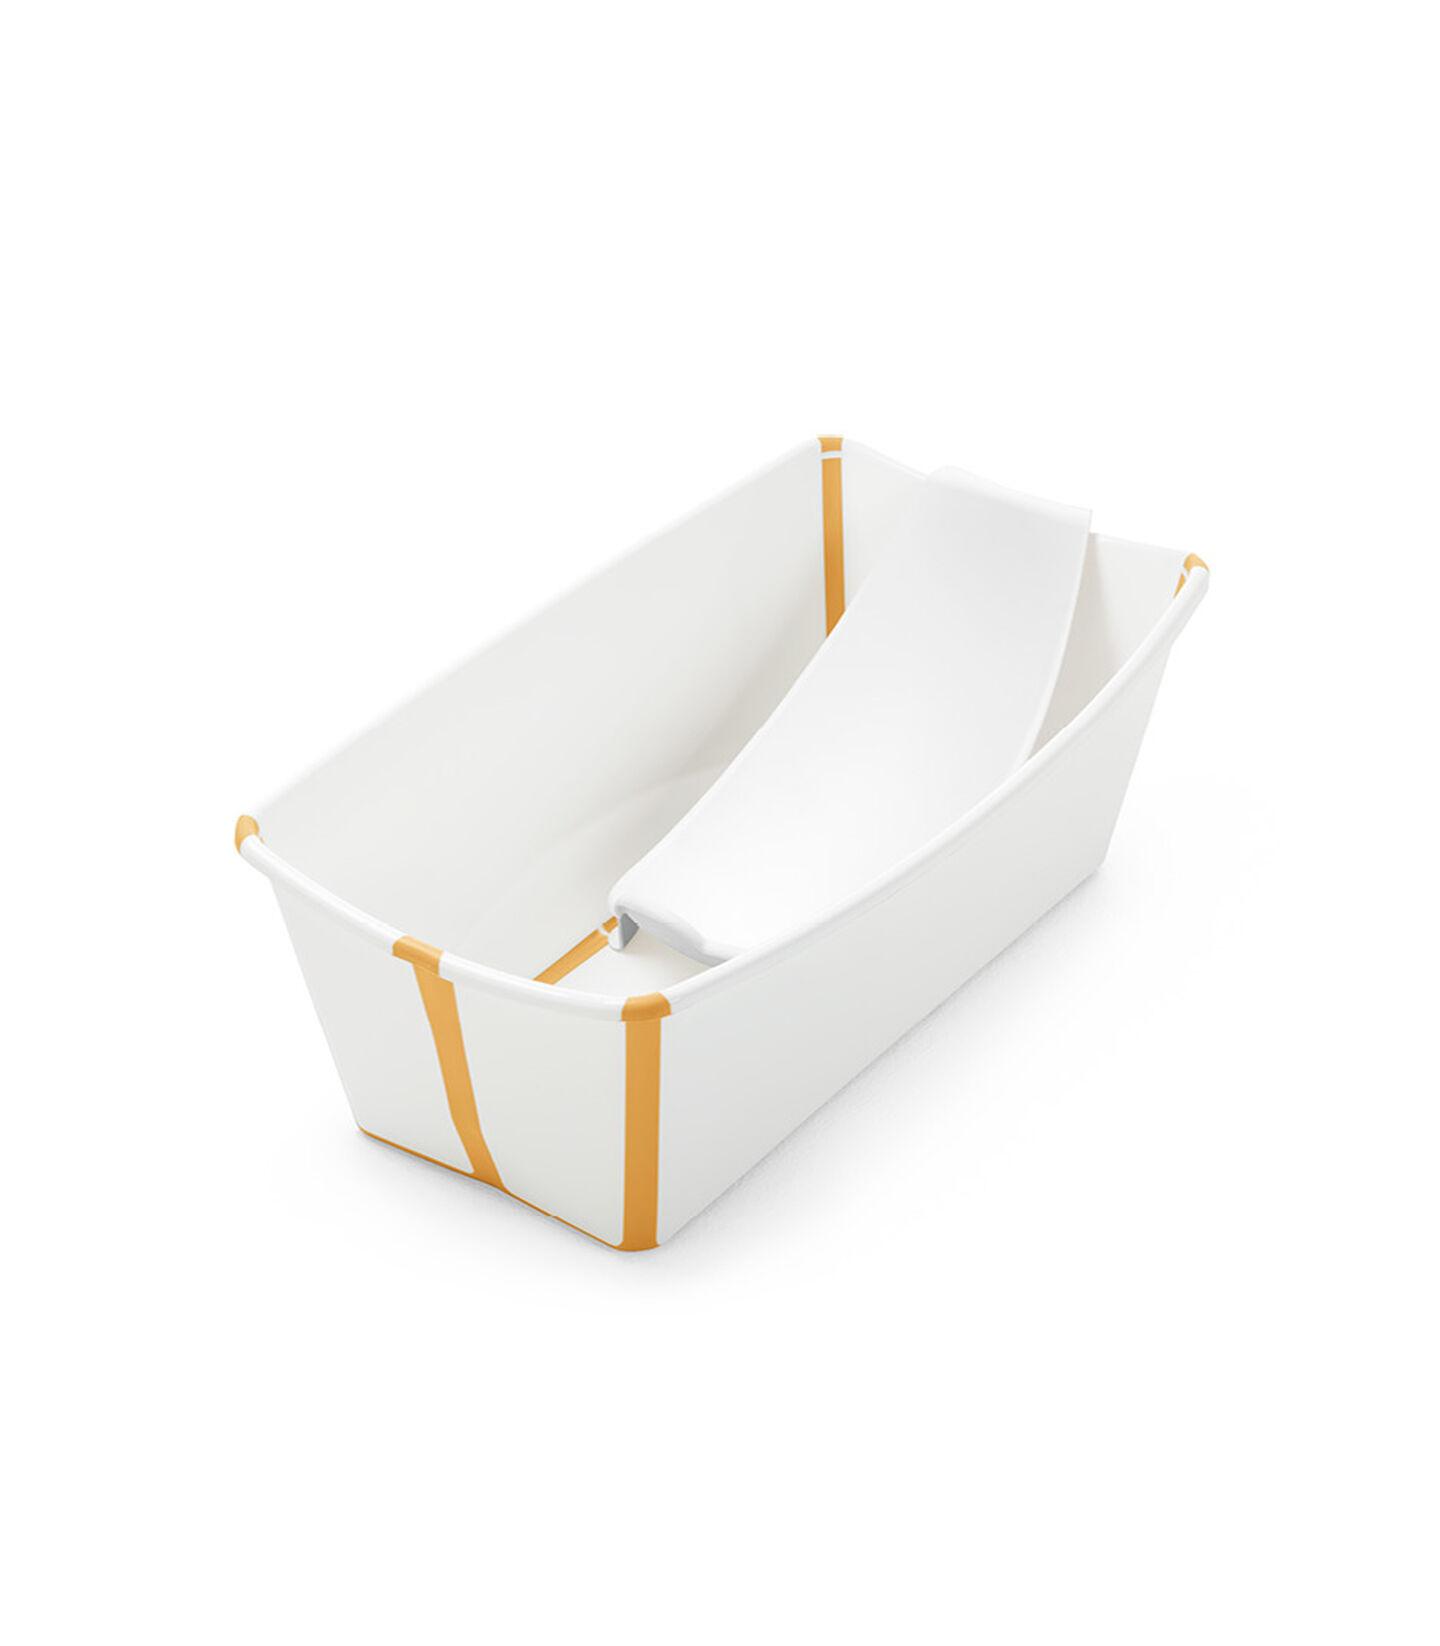 Stokke® Flexi Bath® bath tub, White Yellow with Newborn insert. view 1